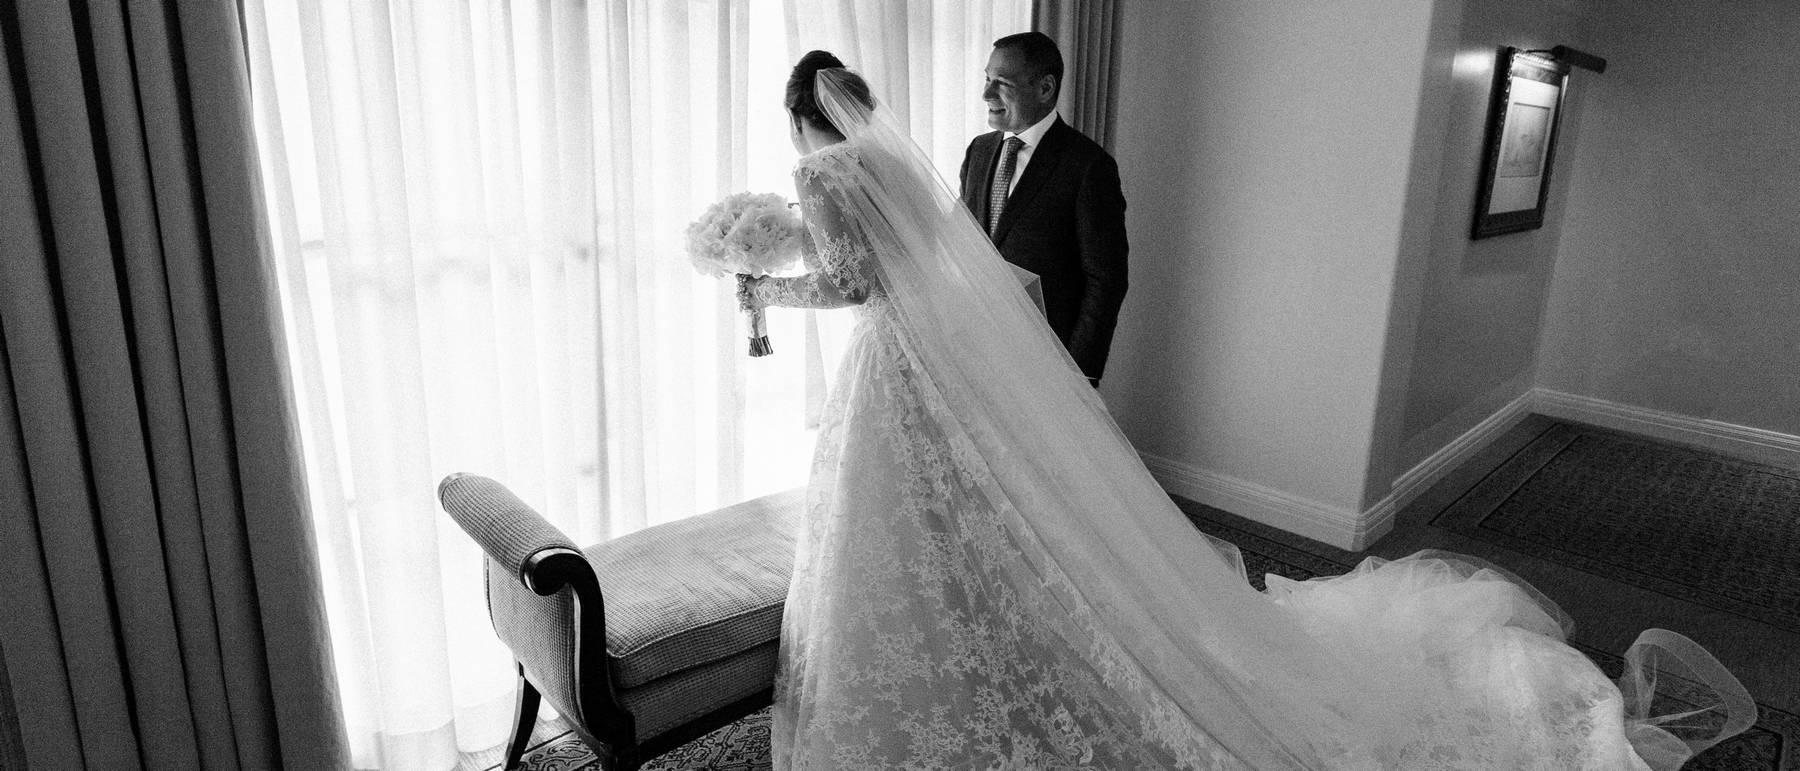 johnandjoseph-wedding-photographer-hz-slider-121